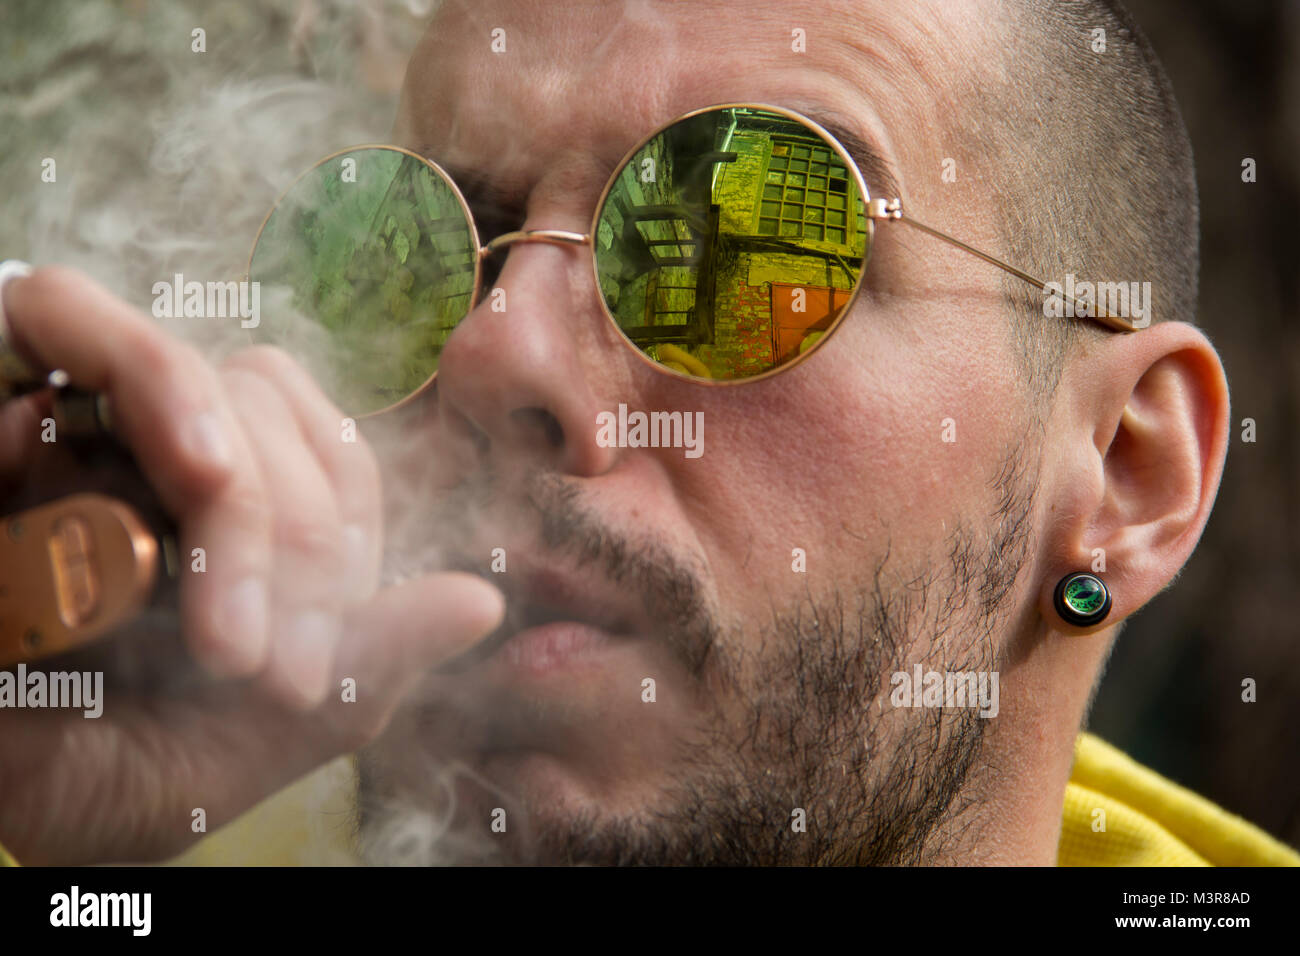 Portrait of a Vaper smoking an electronic cigarette - Stock Image